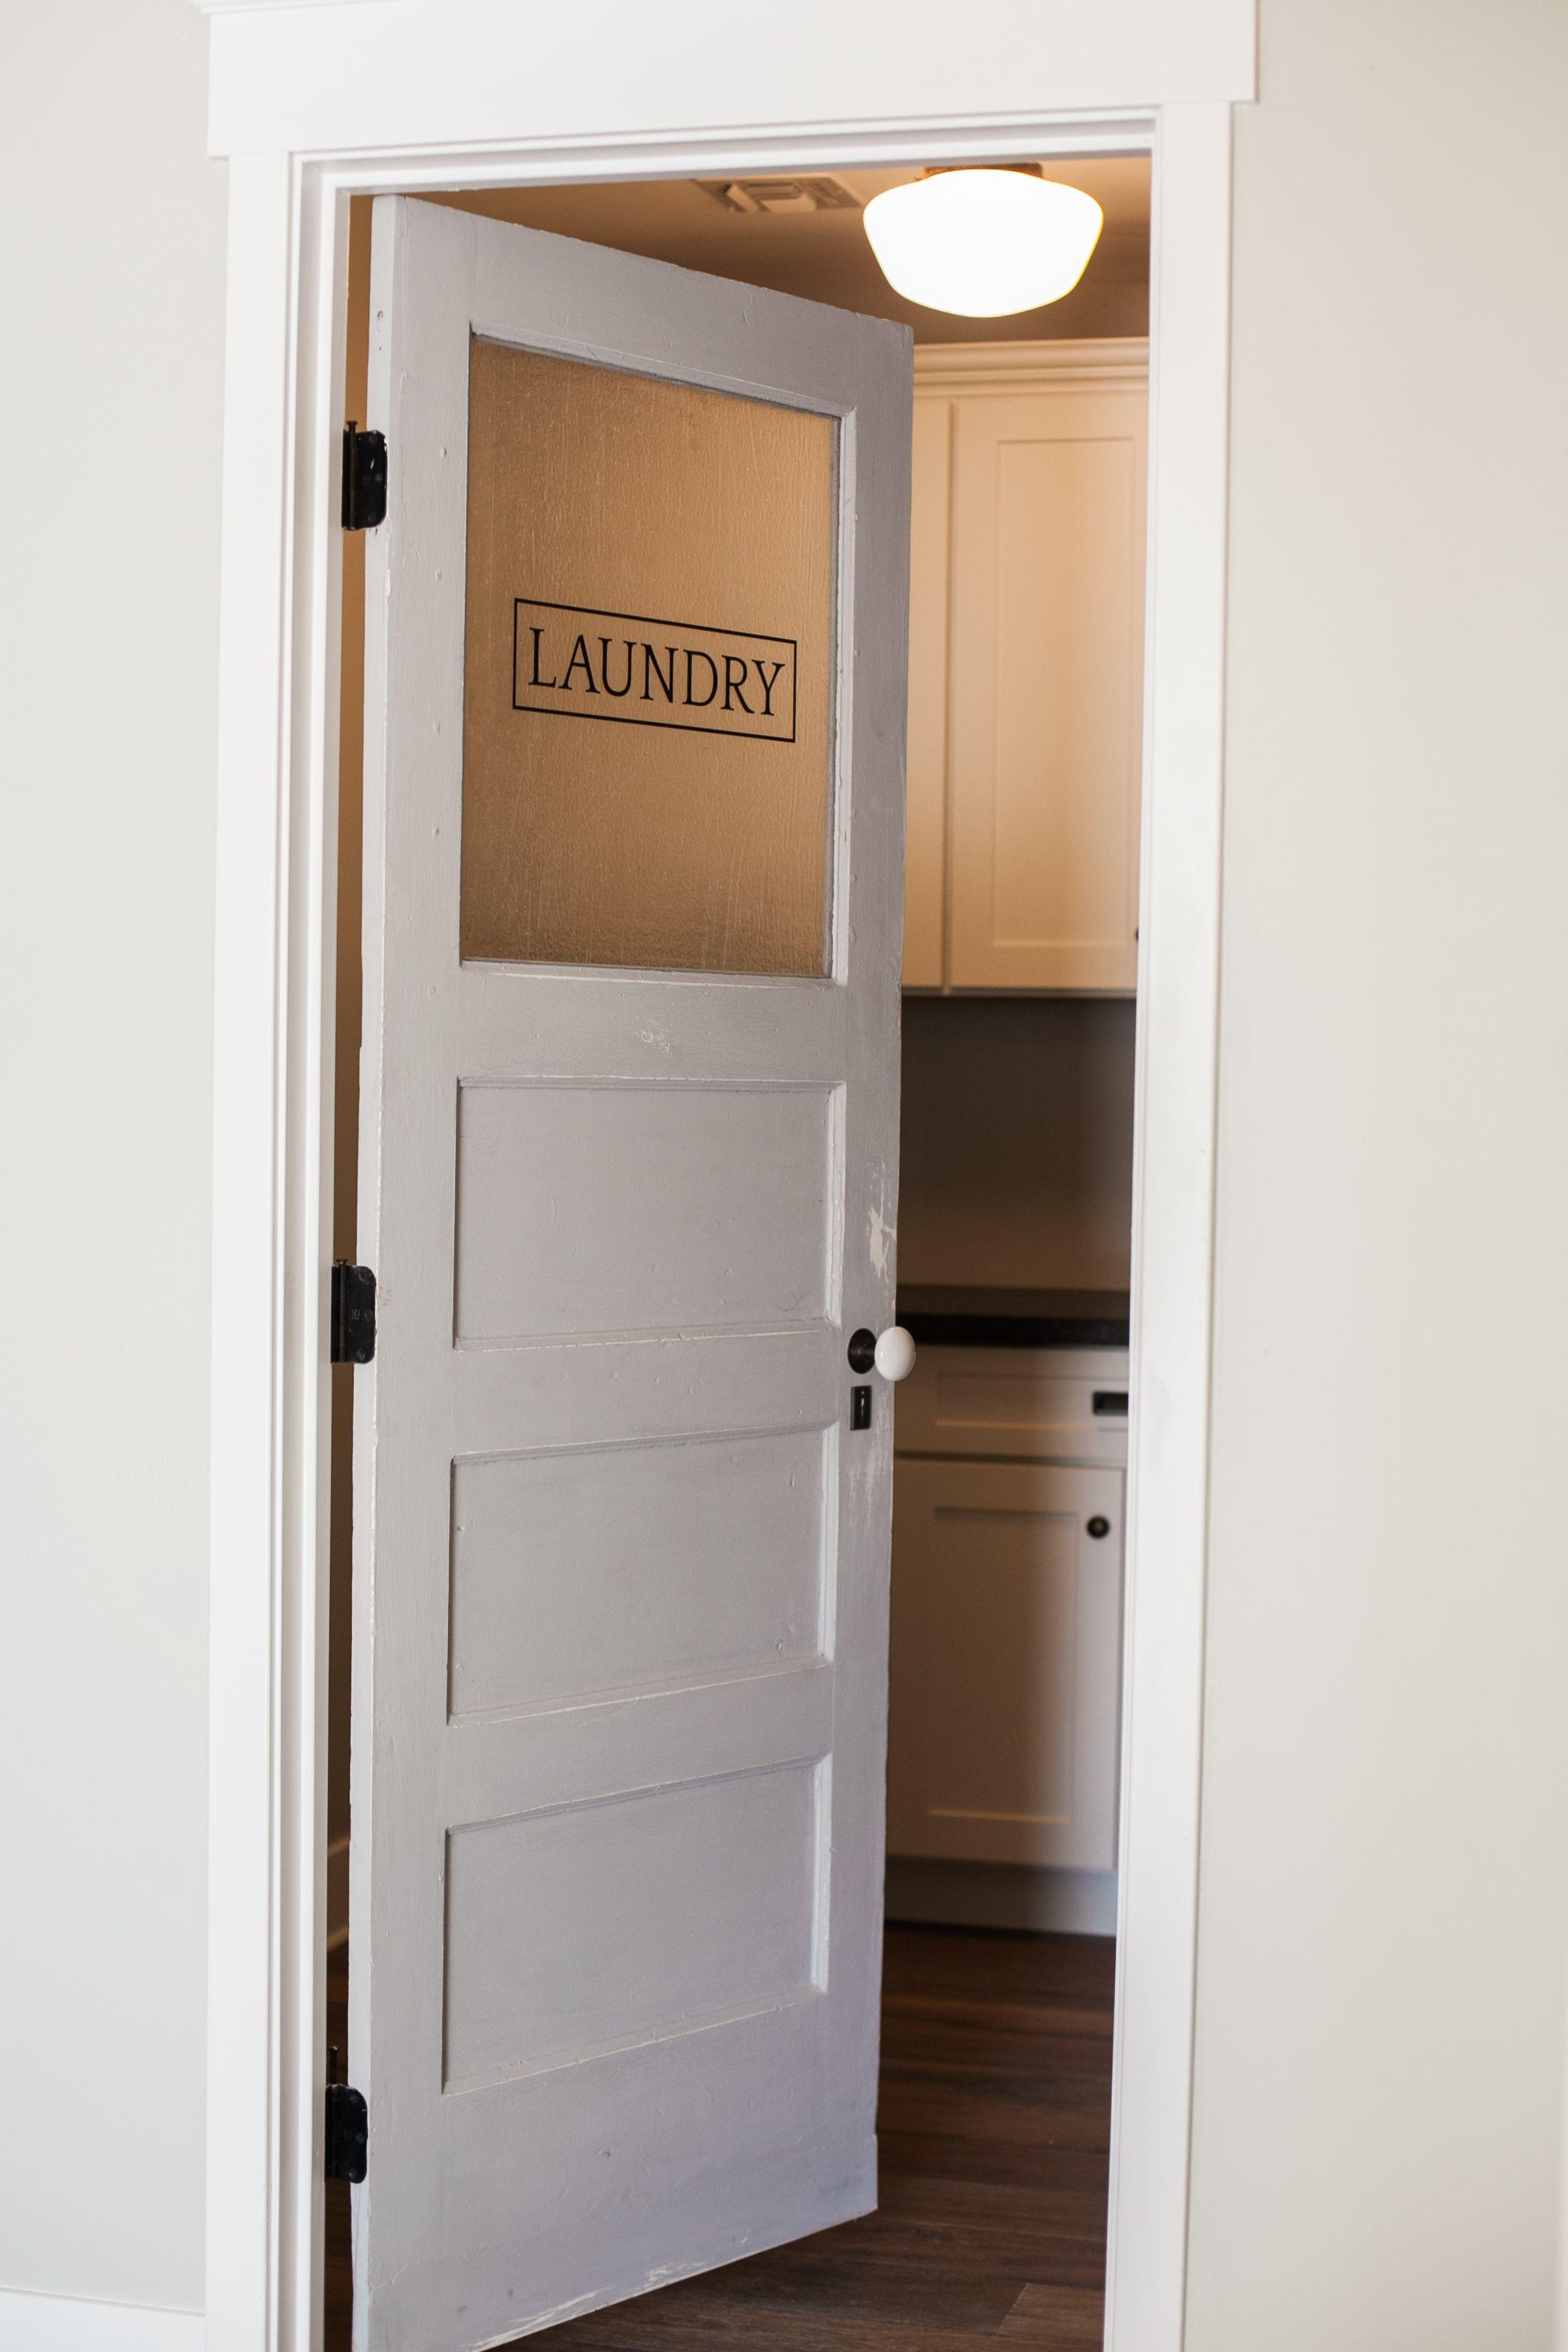 Signature laundry door by Rafterhouse. … Laundry doors